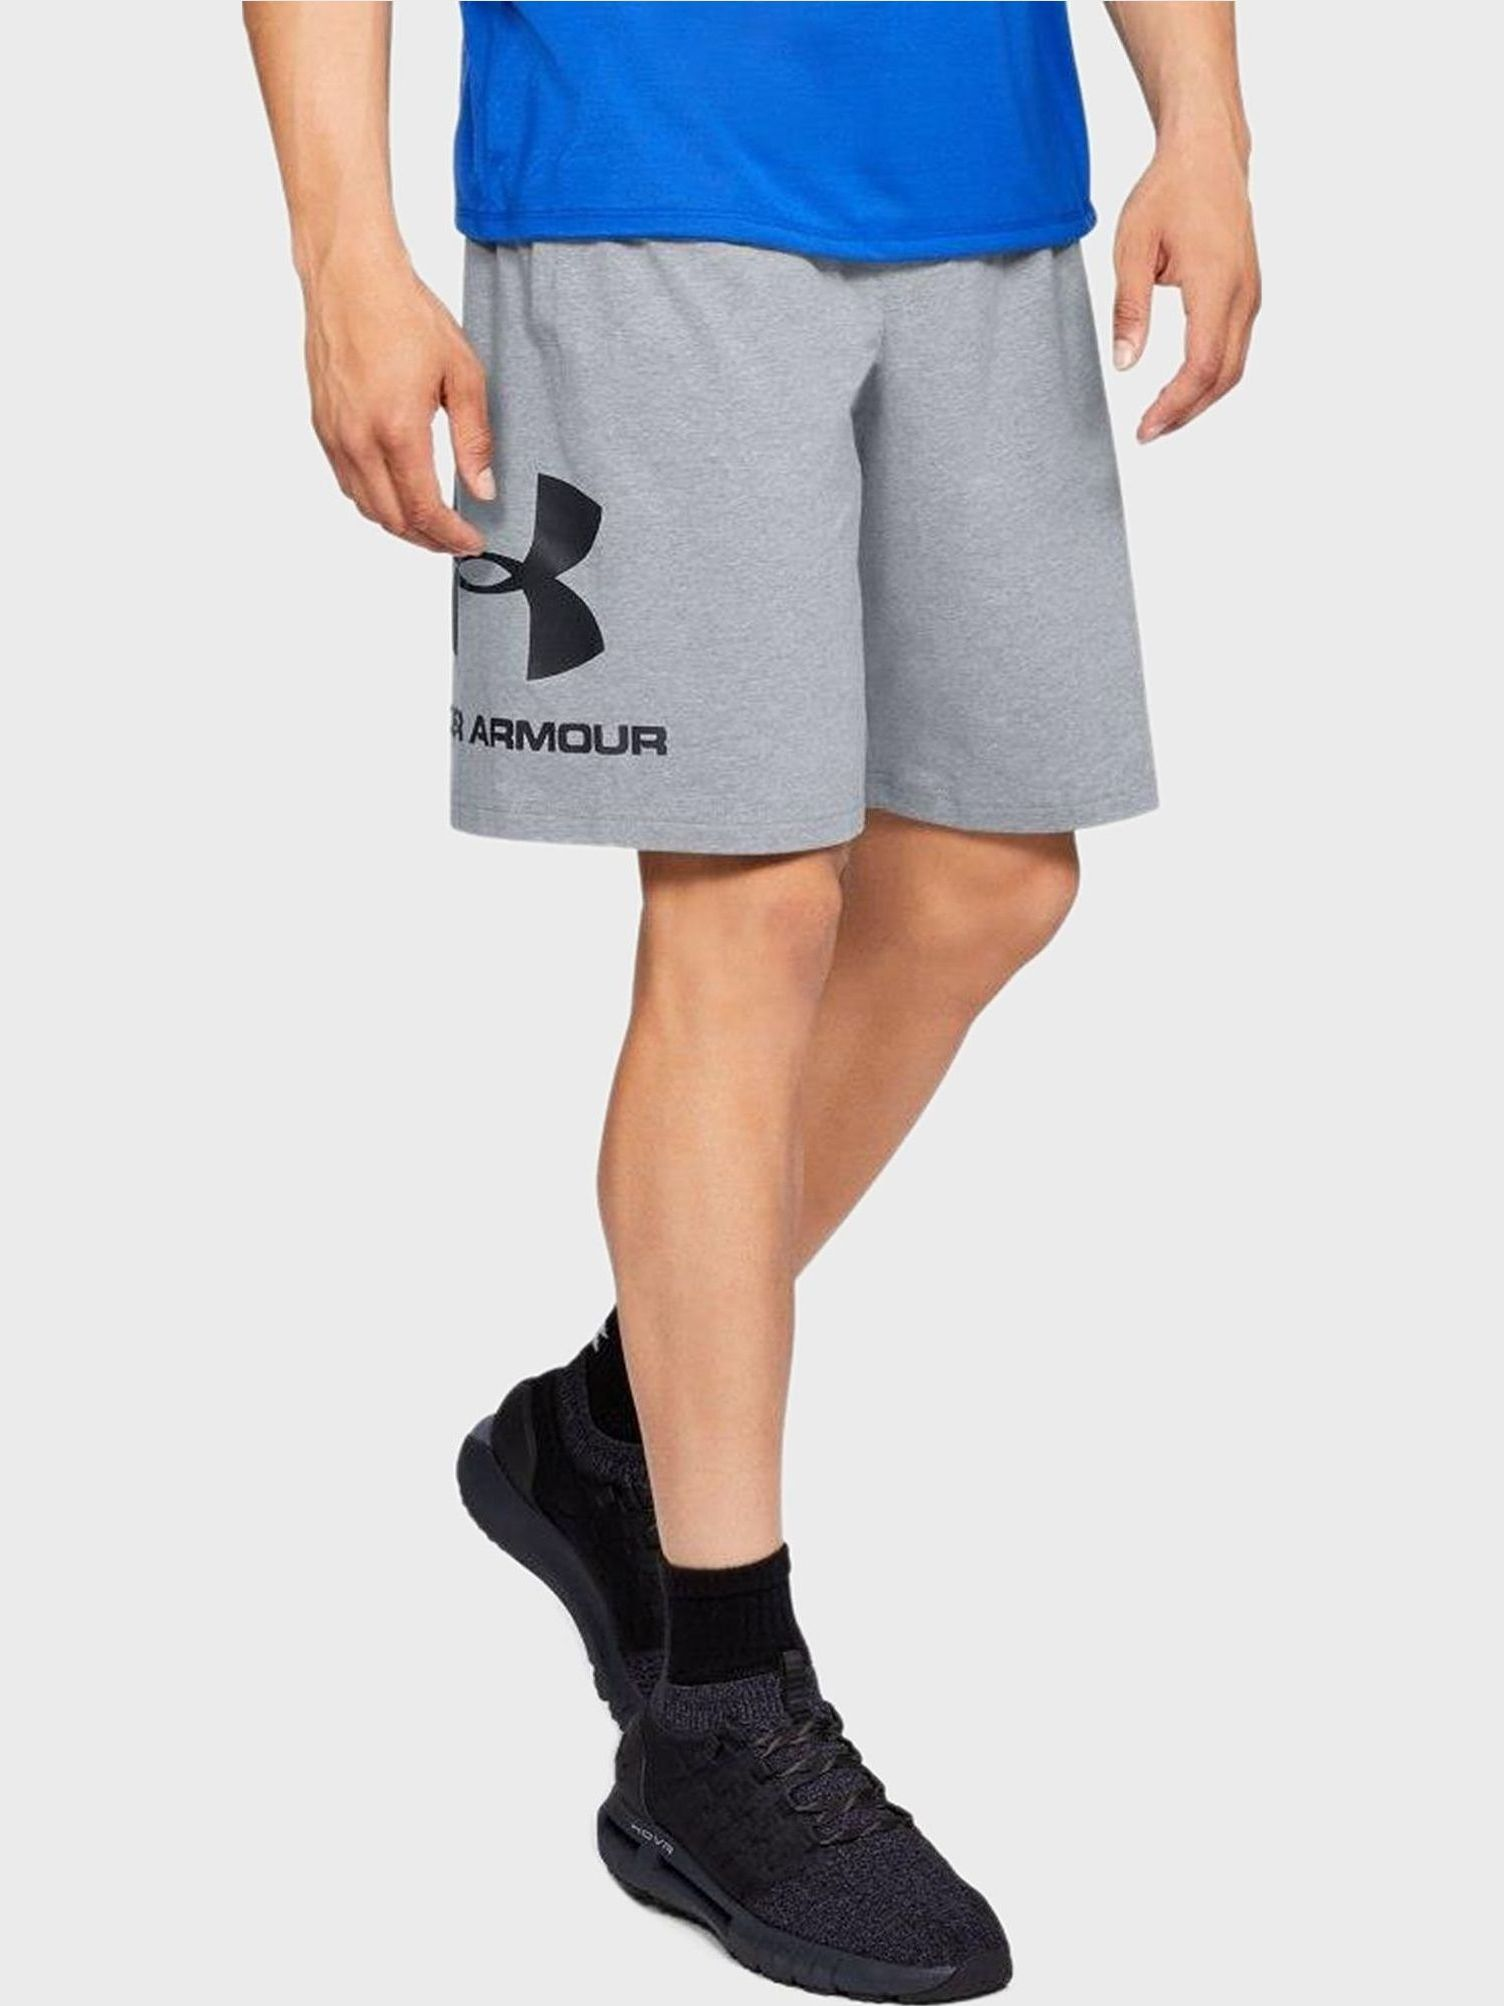 Шорты Under Armour Ua Sportstyle Cotton Shorts-Gry 1329300-035 L Серые (192006921134)